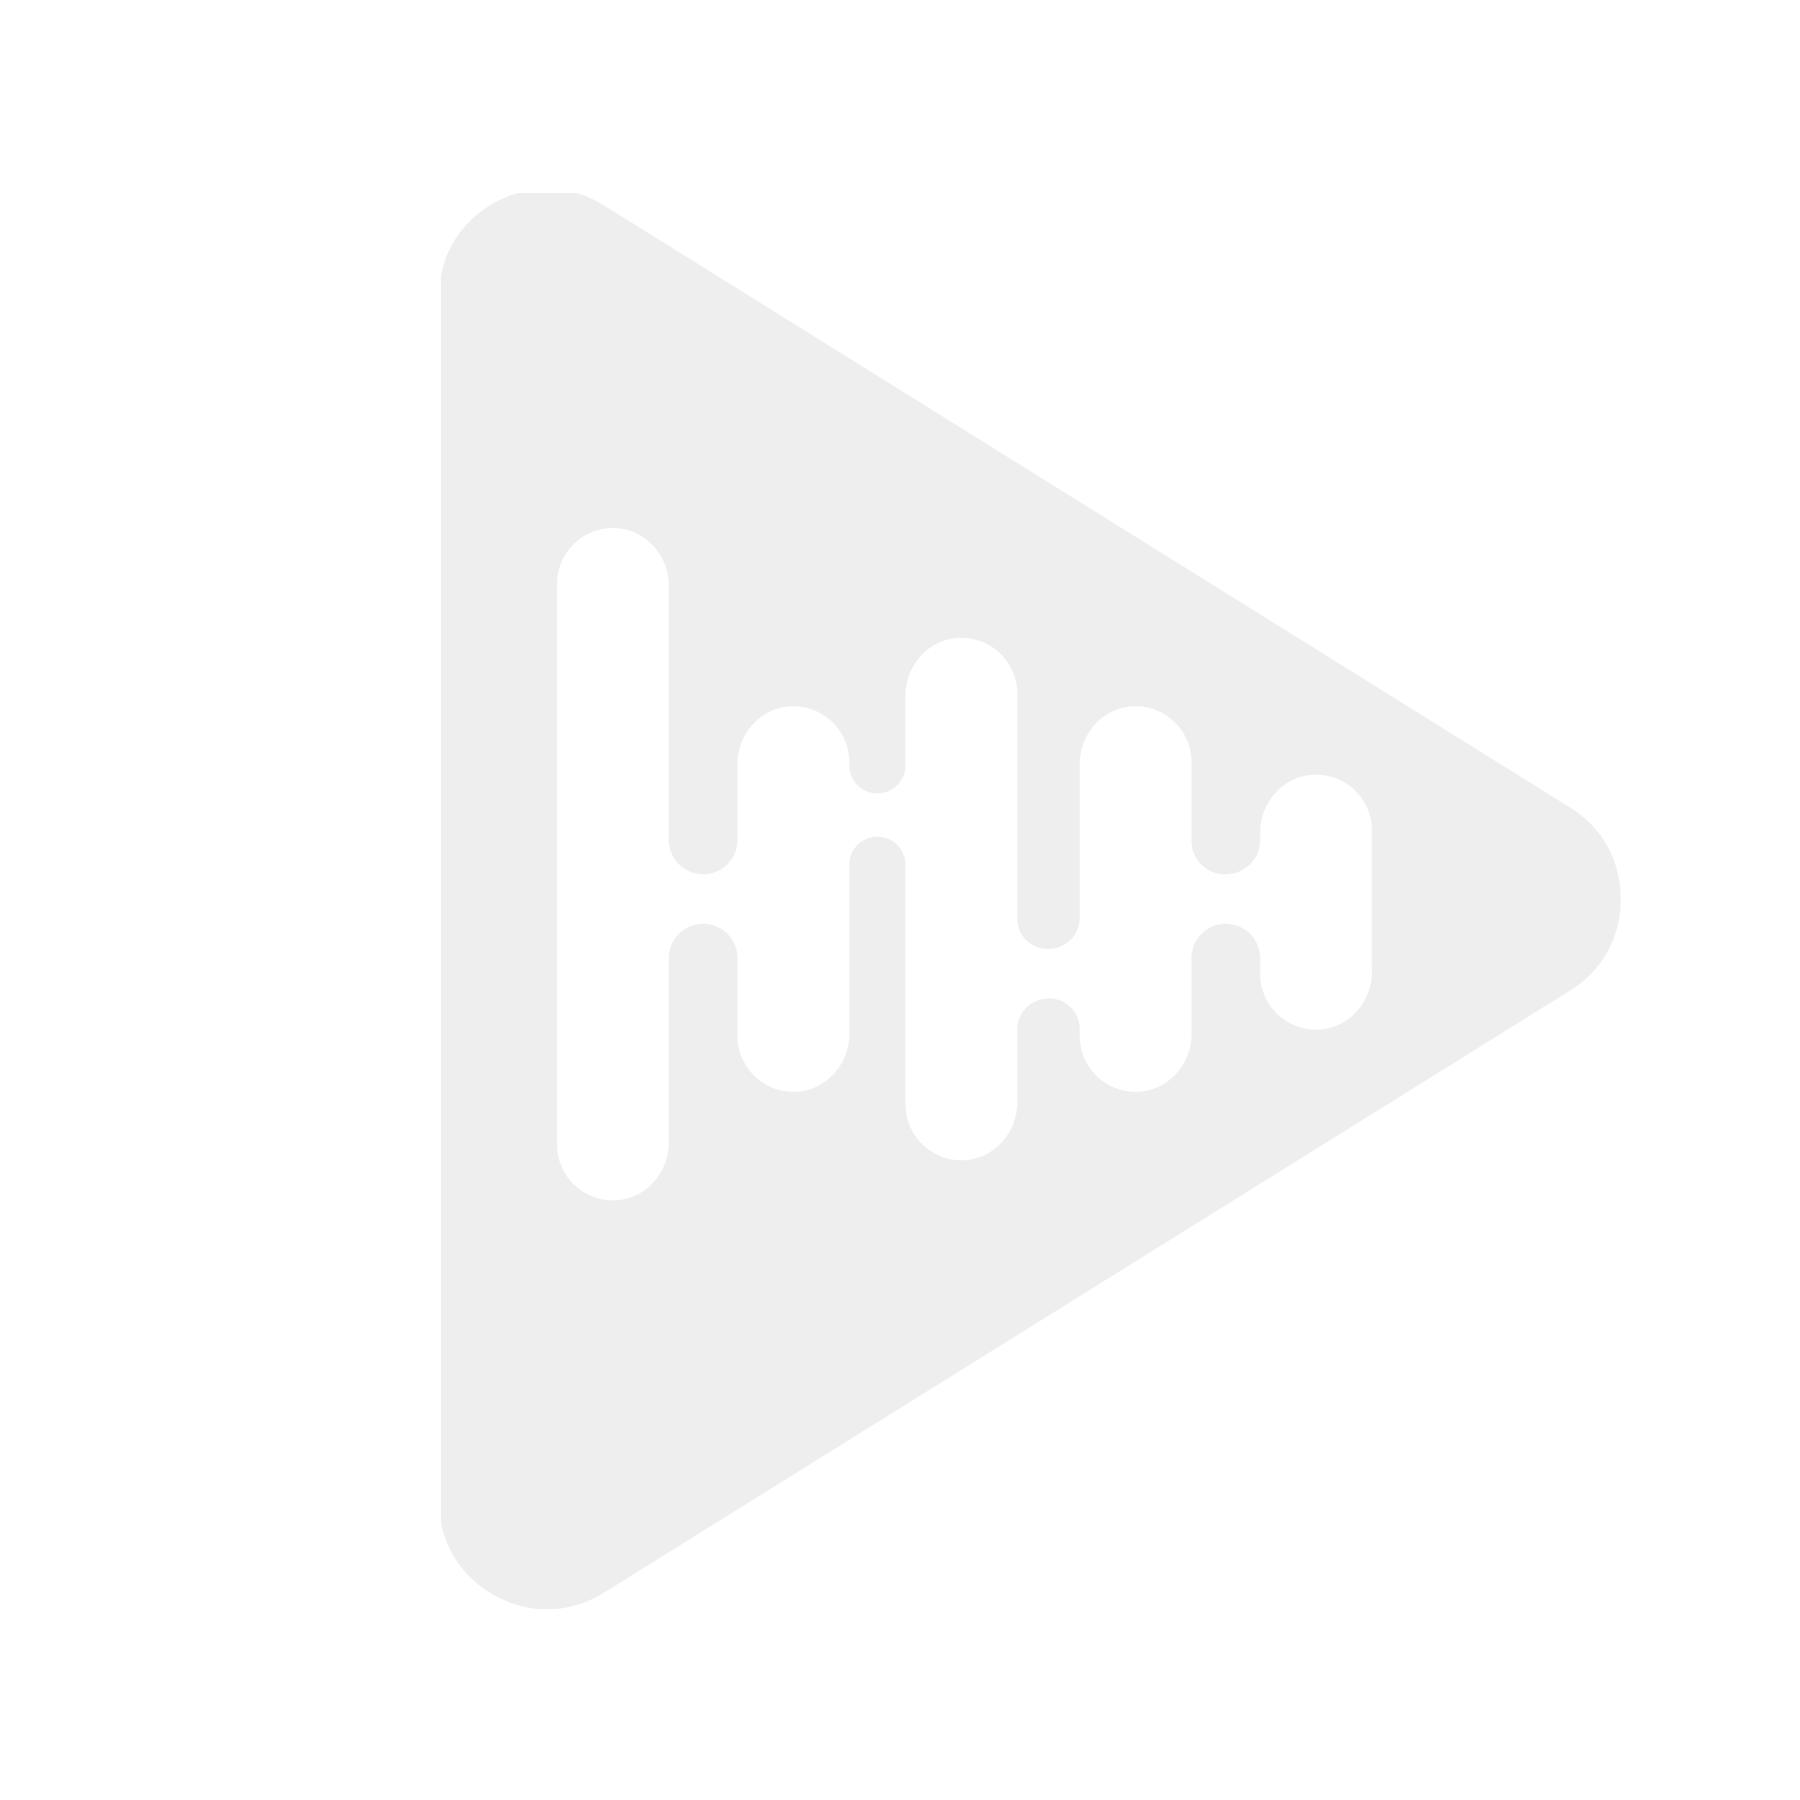 Hertz Compact Power HCP 2 - 2-kanals forsterker, 2x55W (4 ohm)